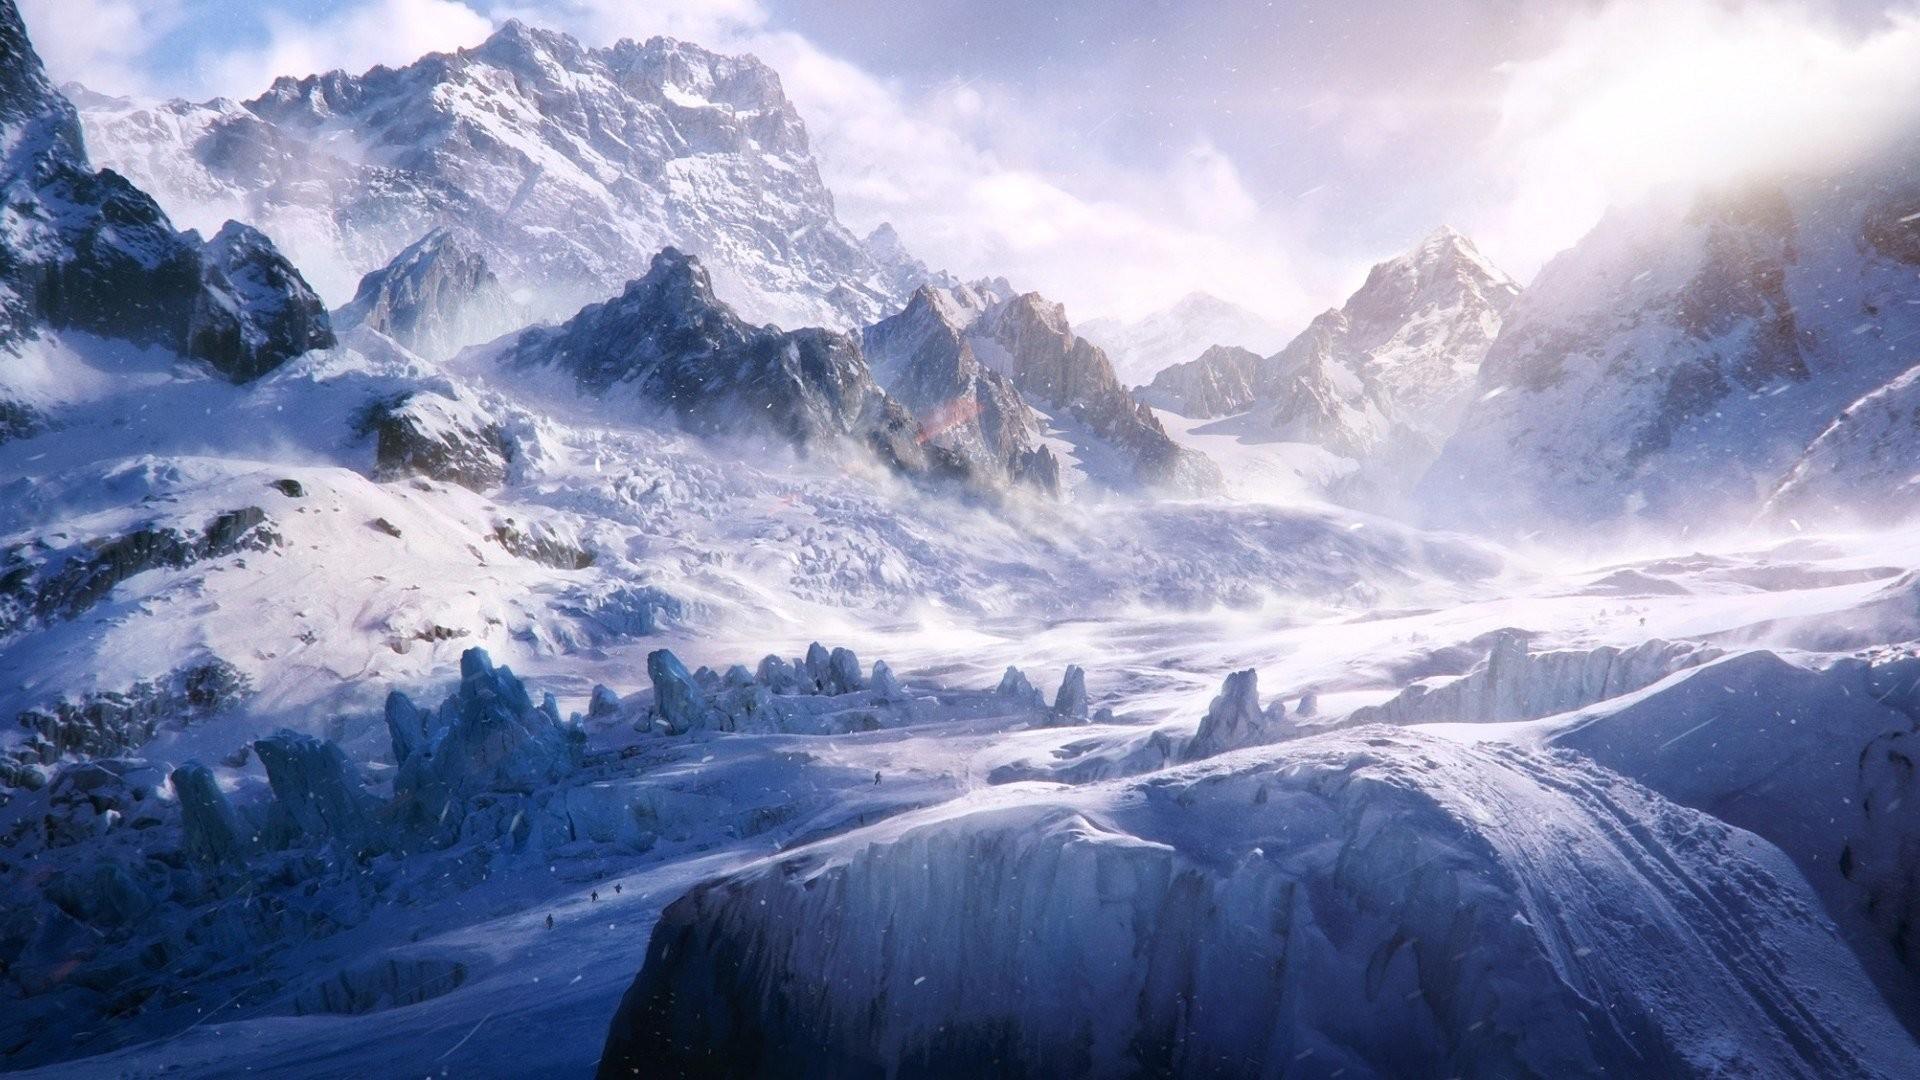 Sfondi Neve 50 Immagini